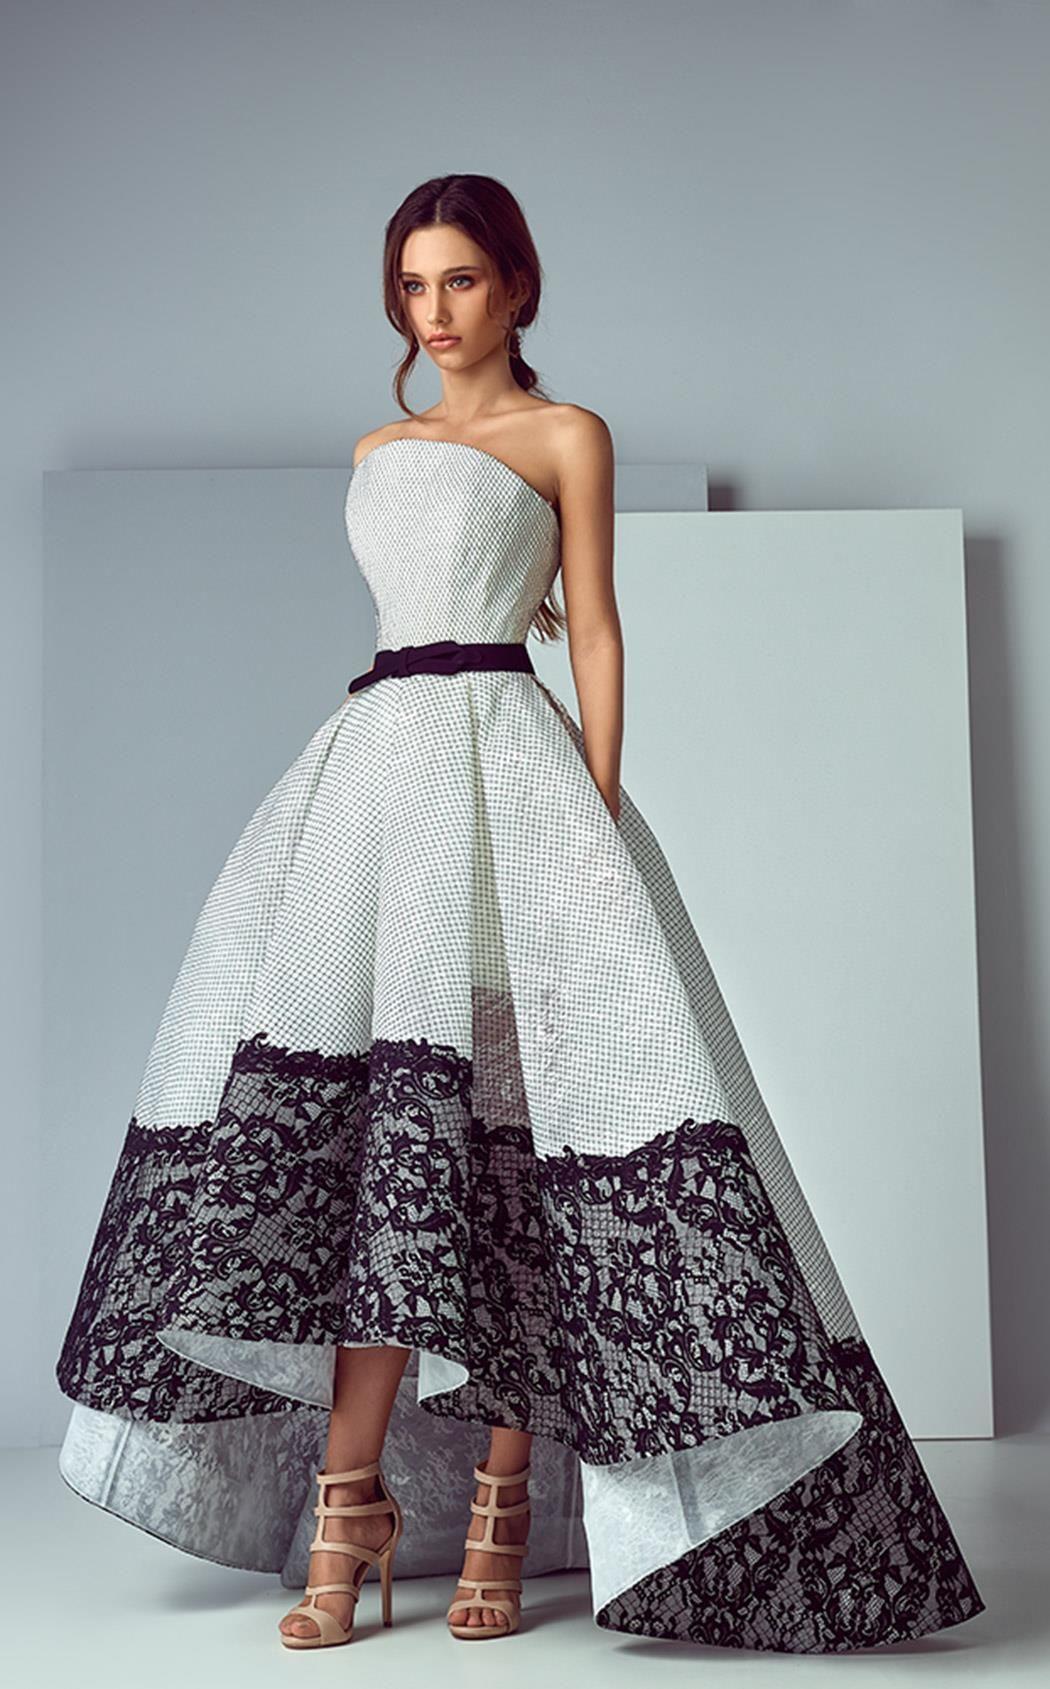 best vestidos images on pinterest wedding dressses marriage